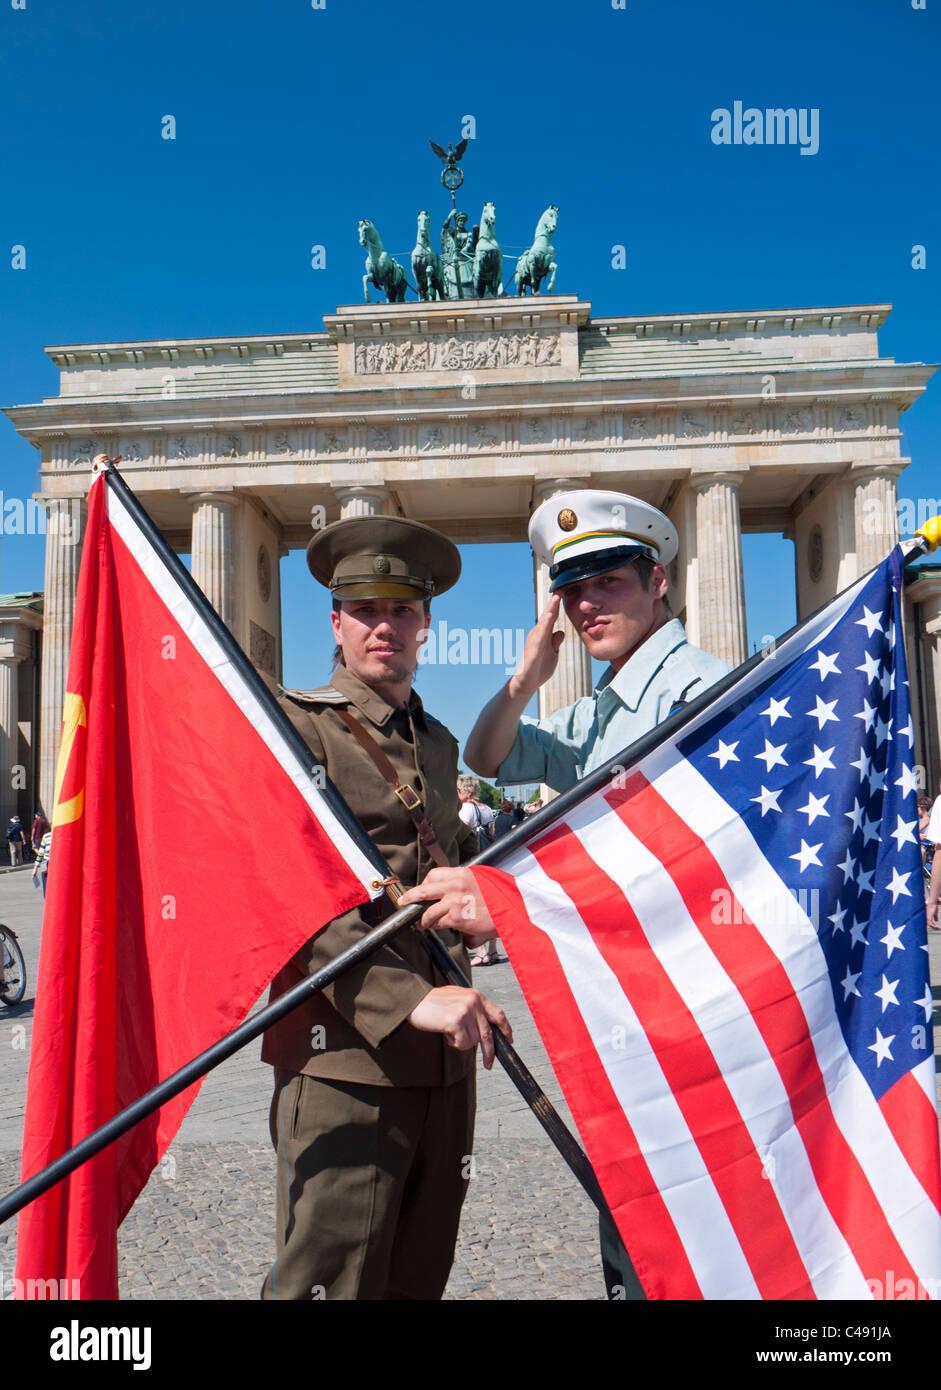 Actors in Soviet and American uniforms posing in-front of Brandenburg Gate in Berlin Germany - Stock Image